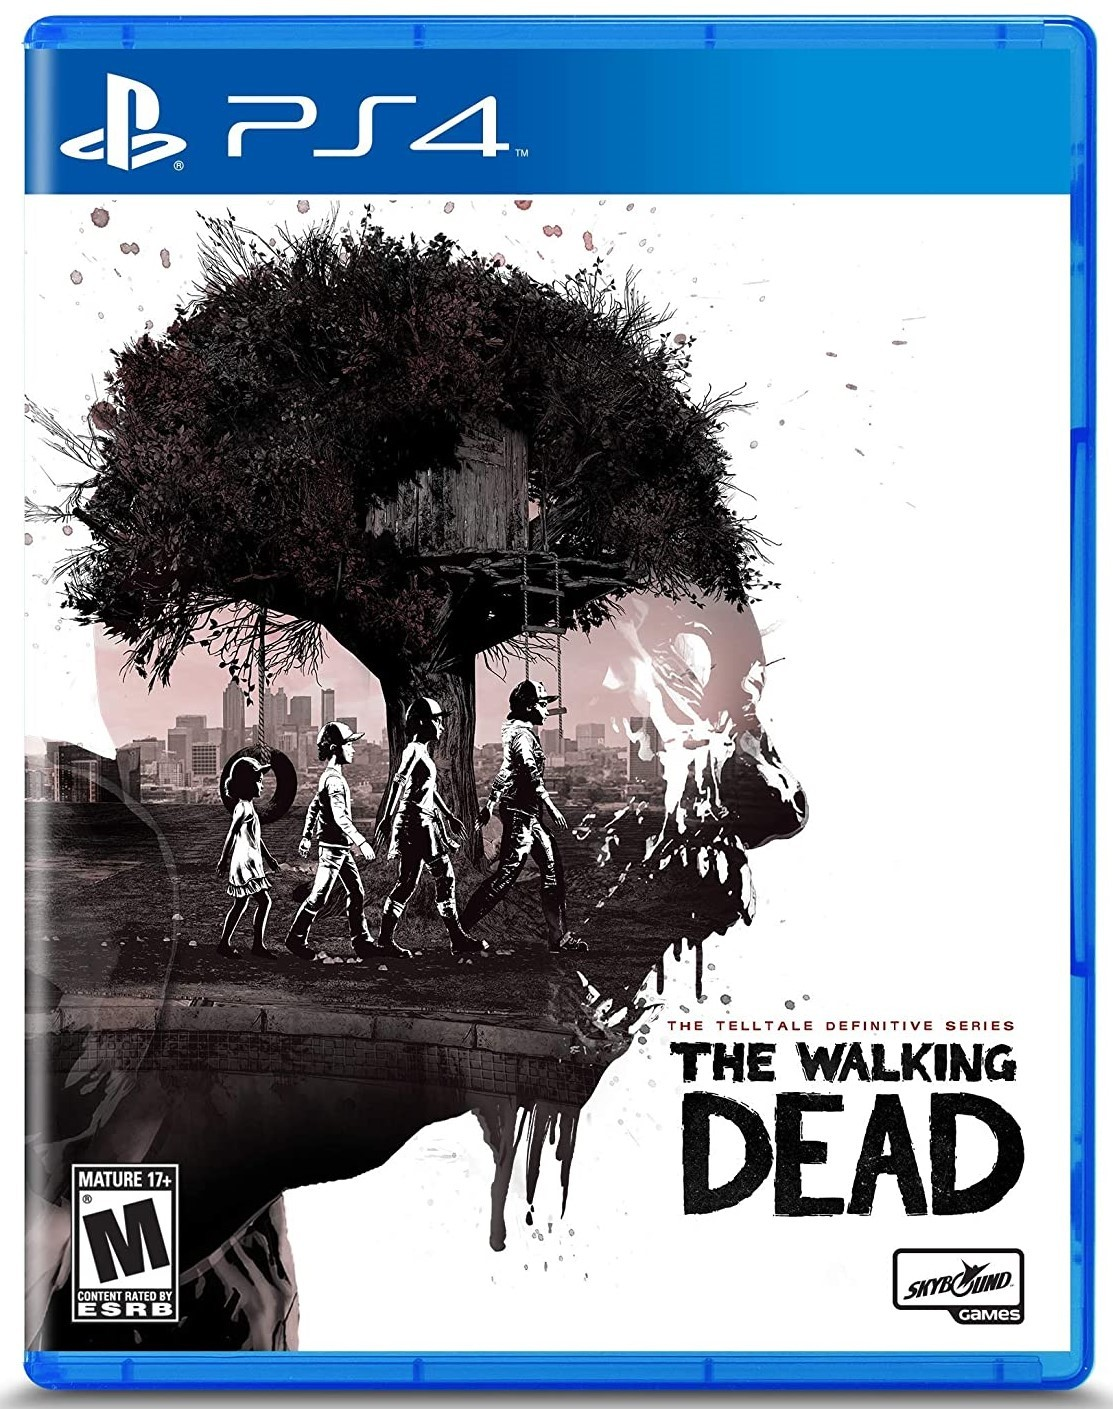 The Walking Dead:The Telltale Definitive Series PS4